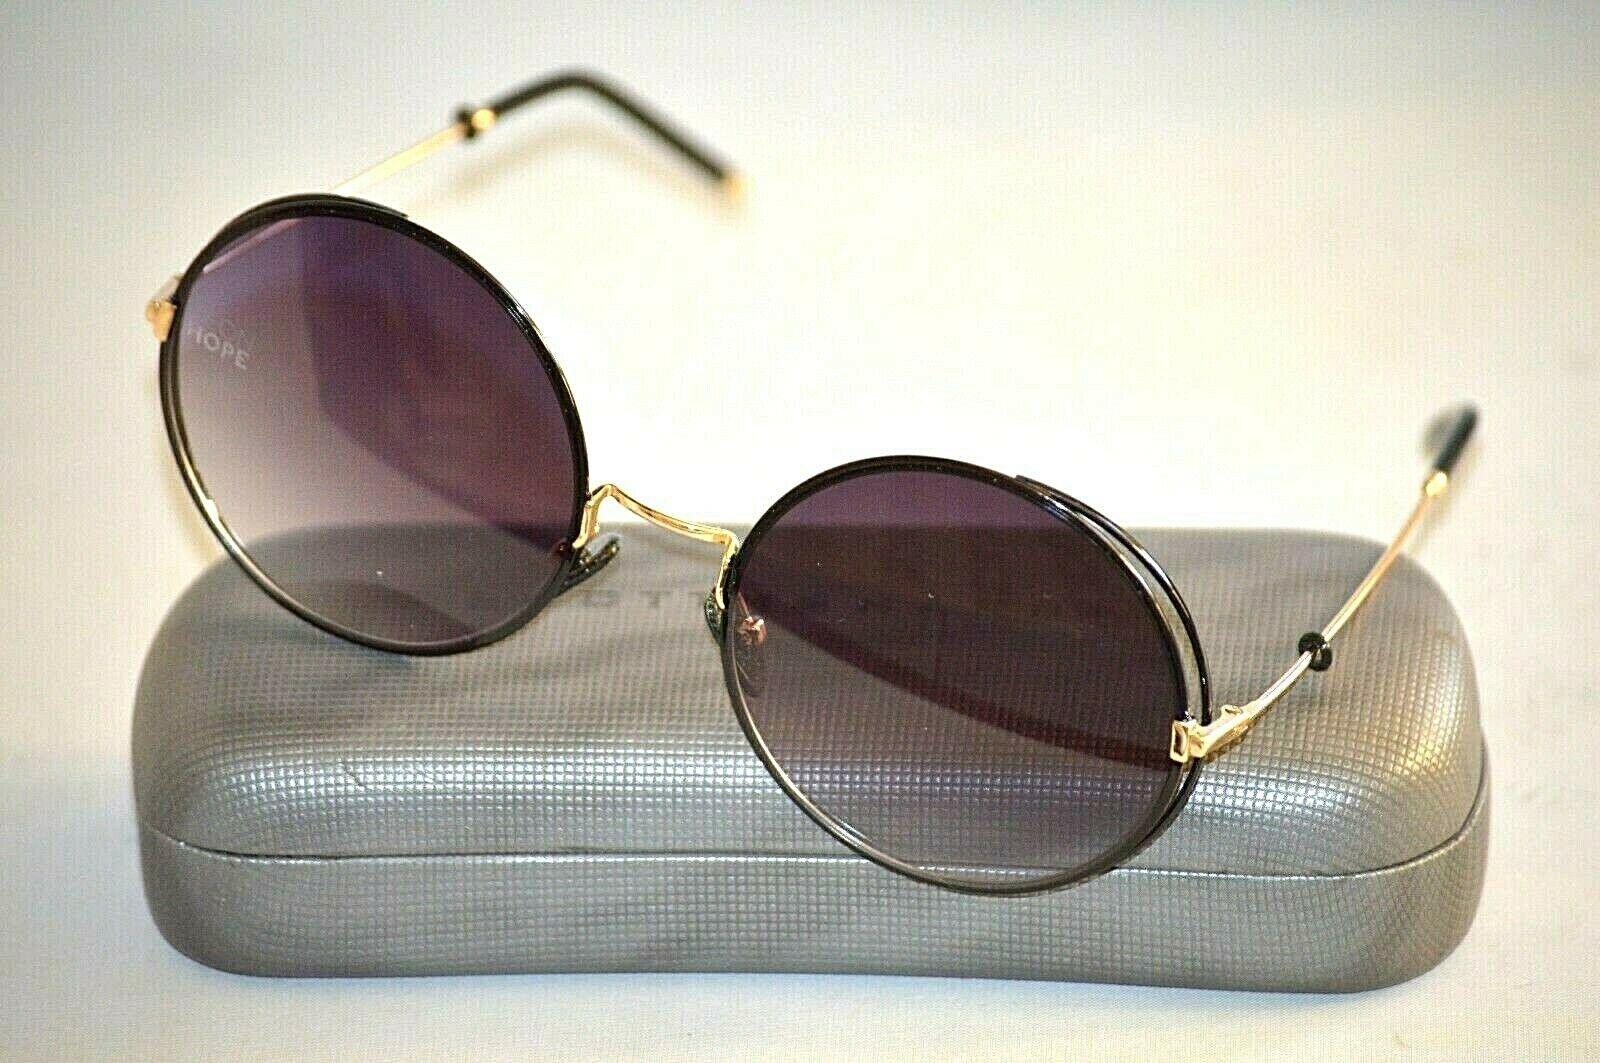 NEON HOPE EOS M2 C1 Black Gold Metal Round Women's Sunglasses